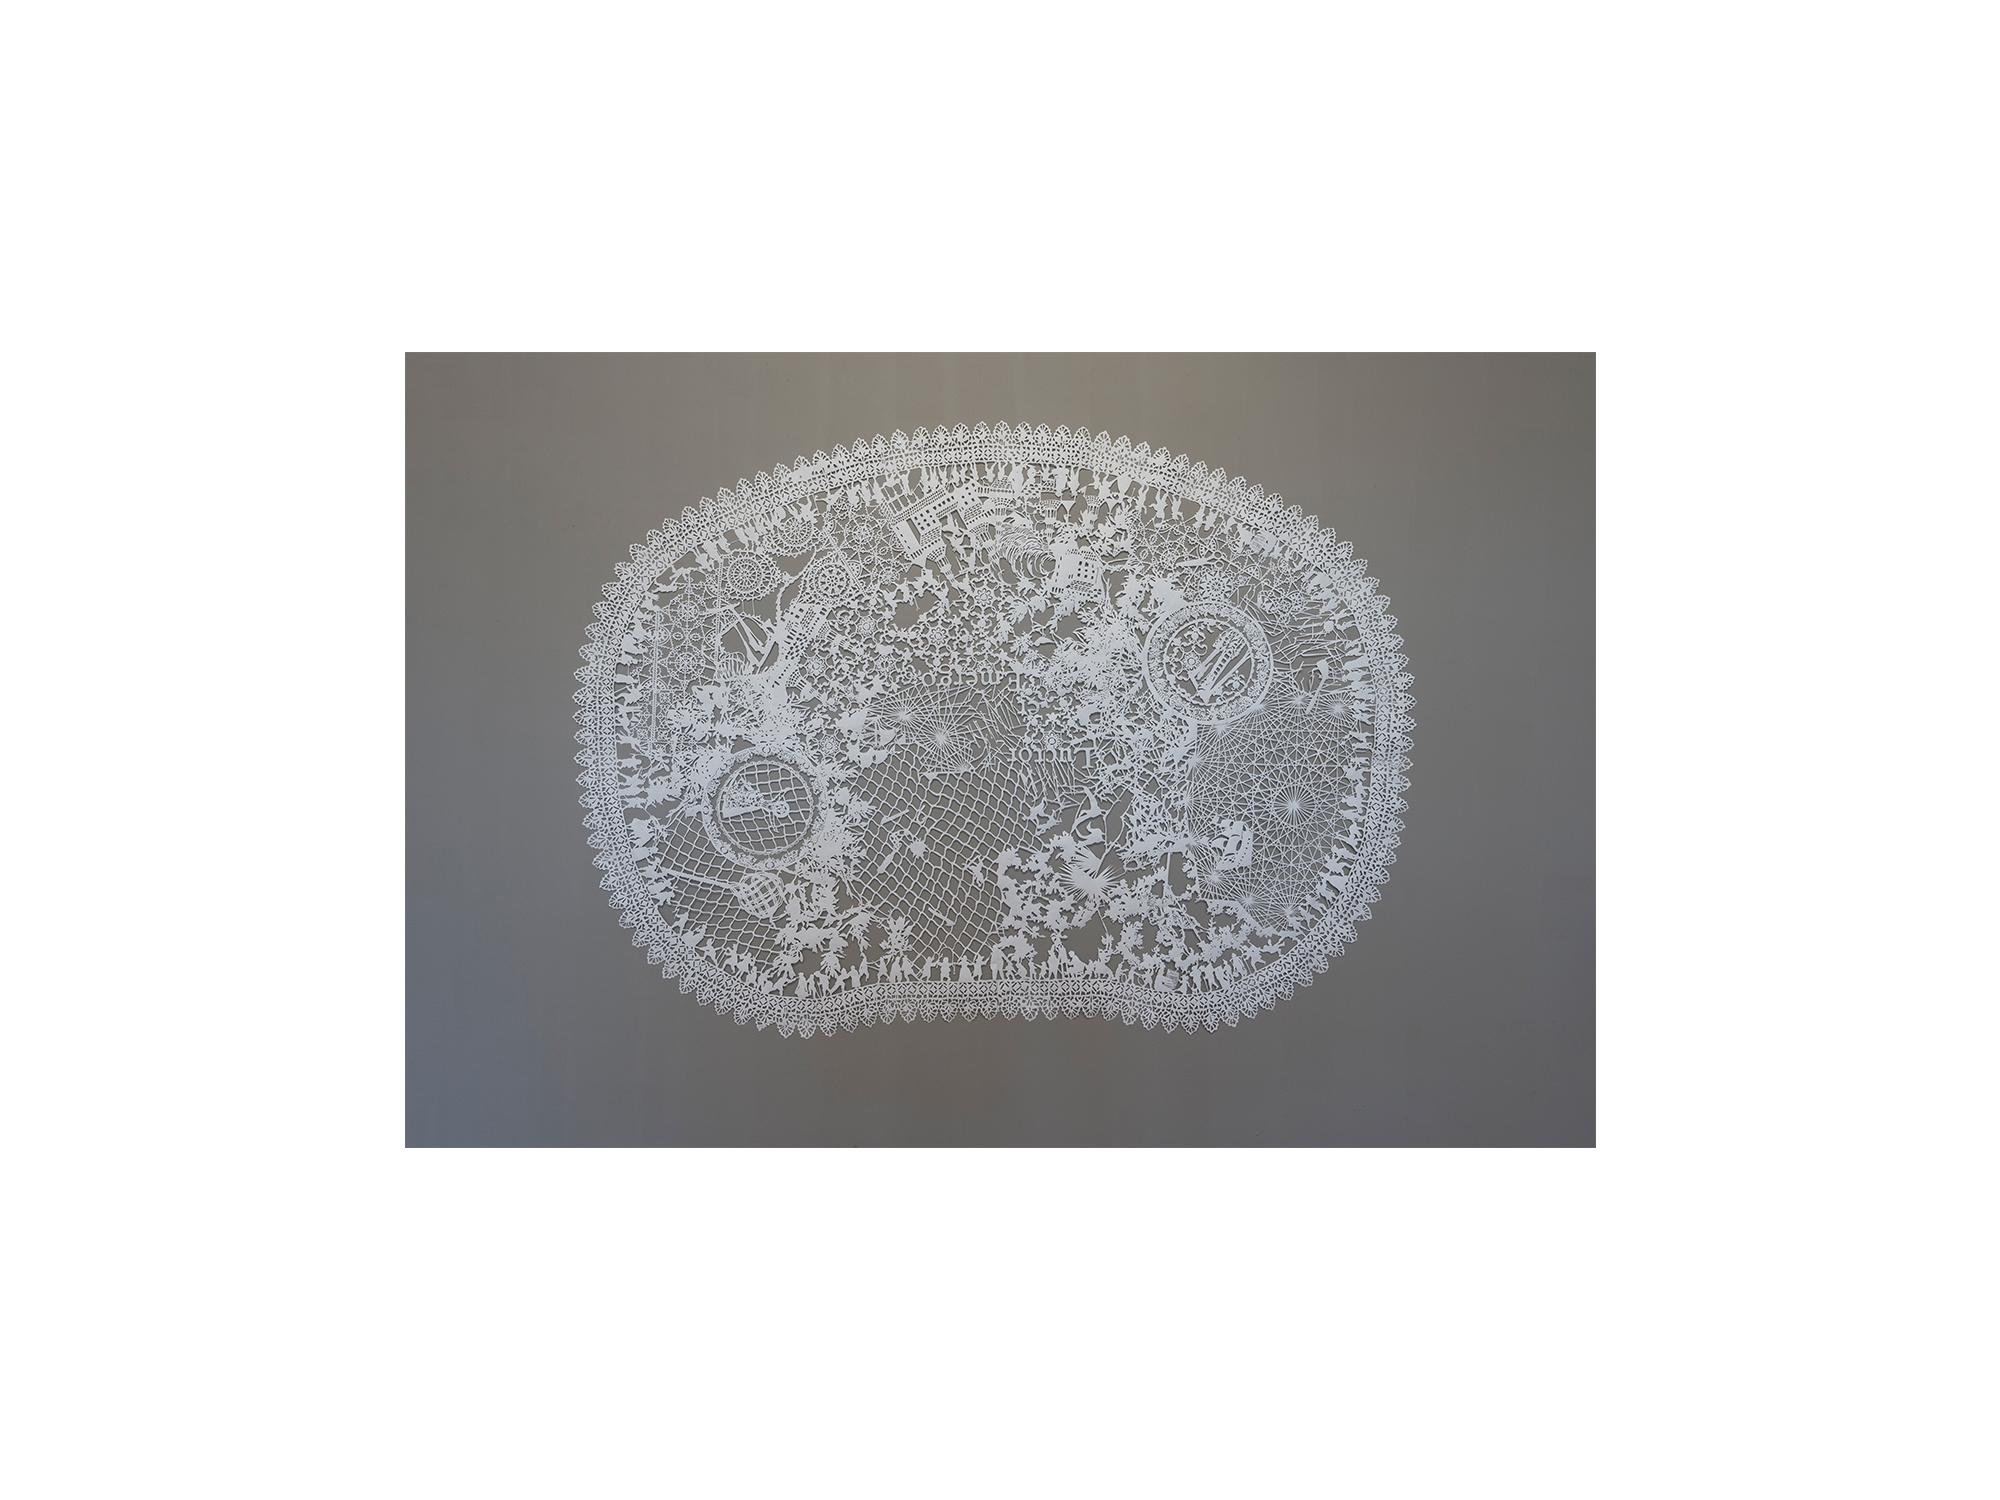 Emma van Leest   Trousseau,      2015 Tyvek synthetic paper 135 x 185cm